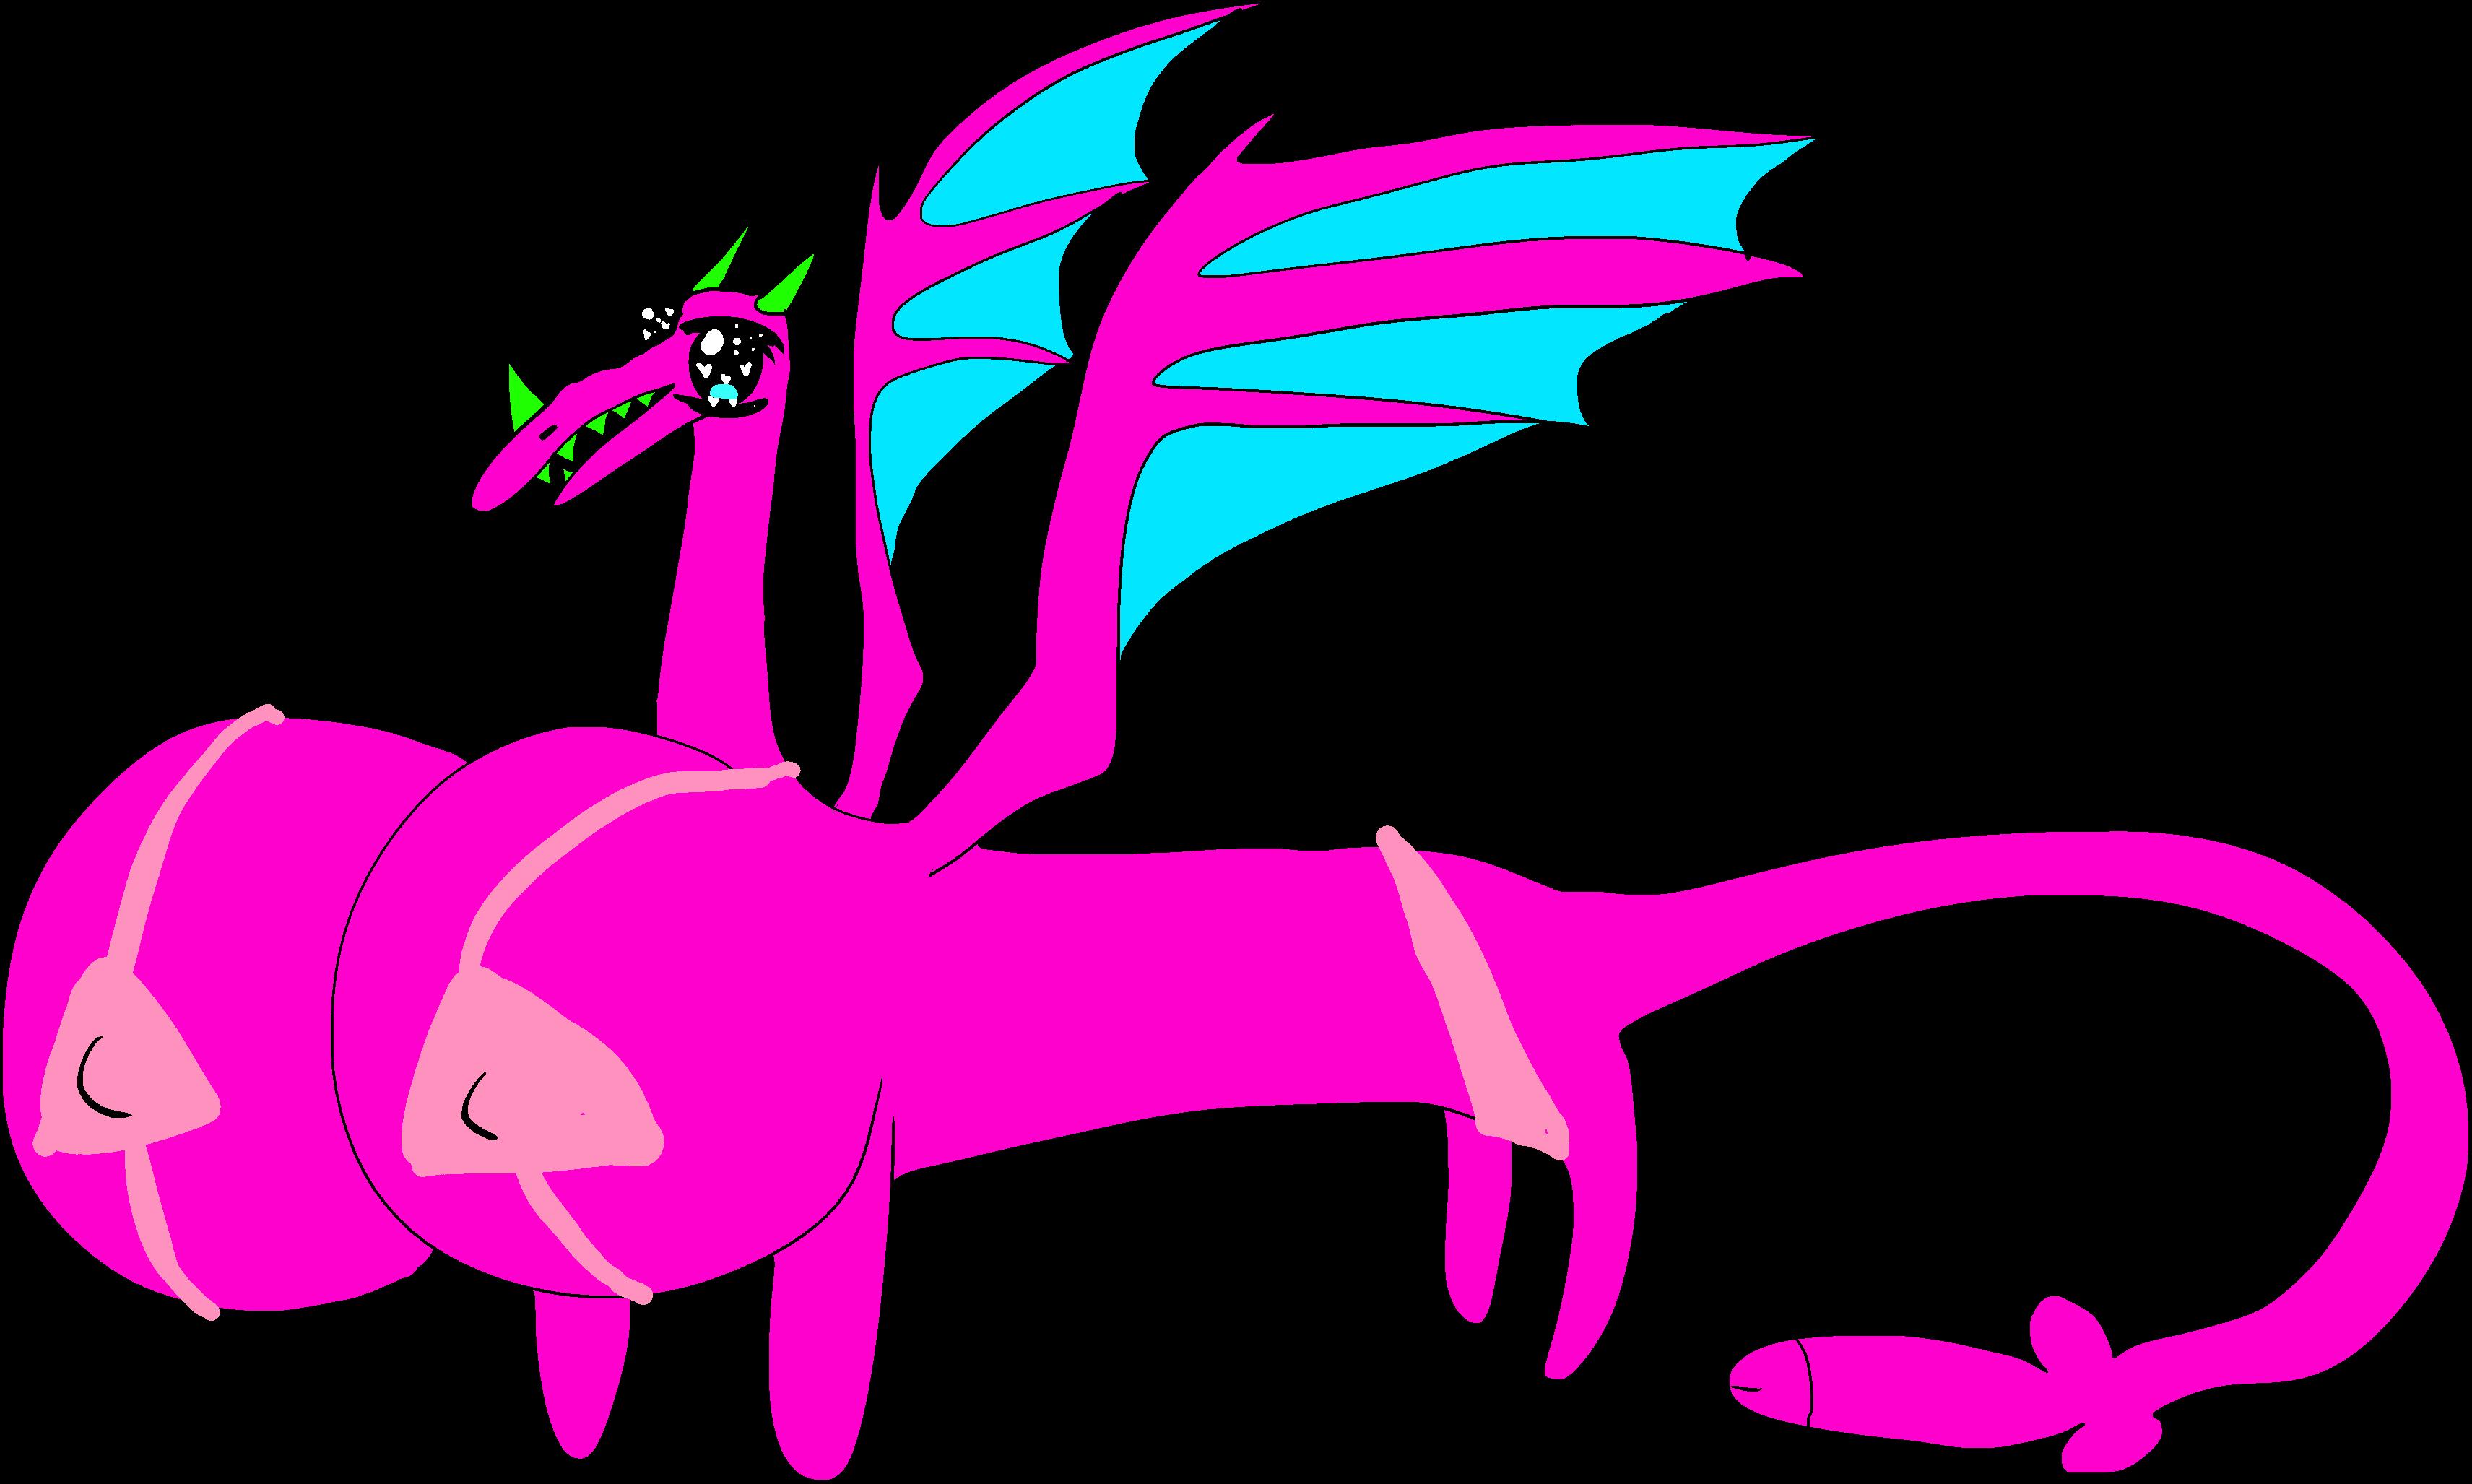 Clipart dragon female dragon. Sugoi base by animukawaiidesubases